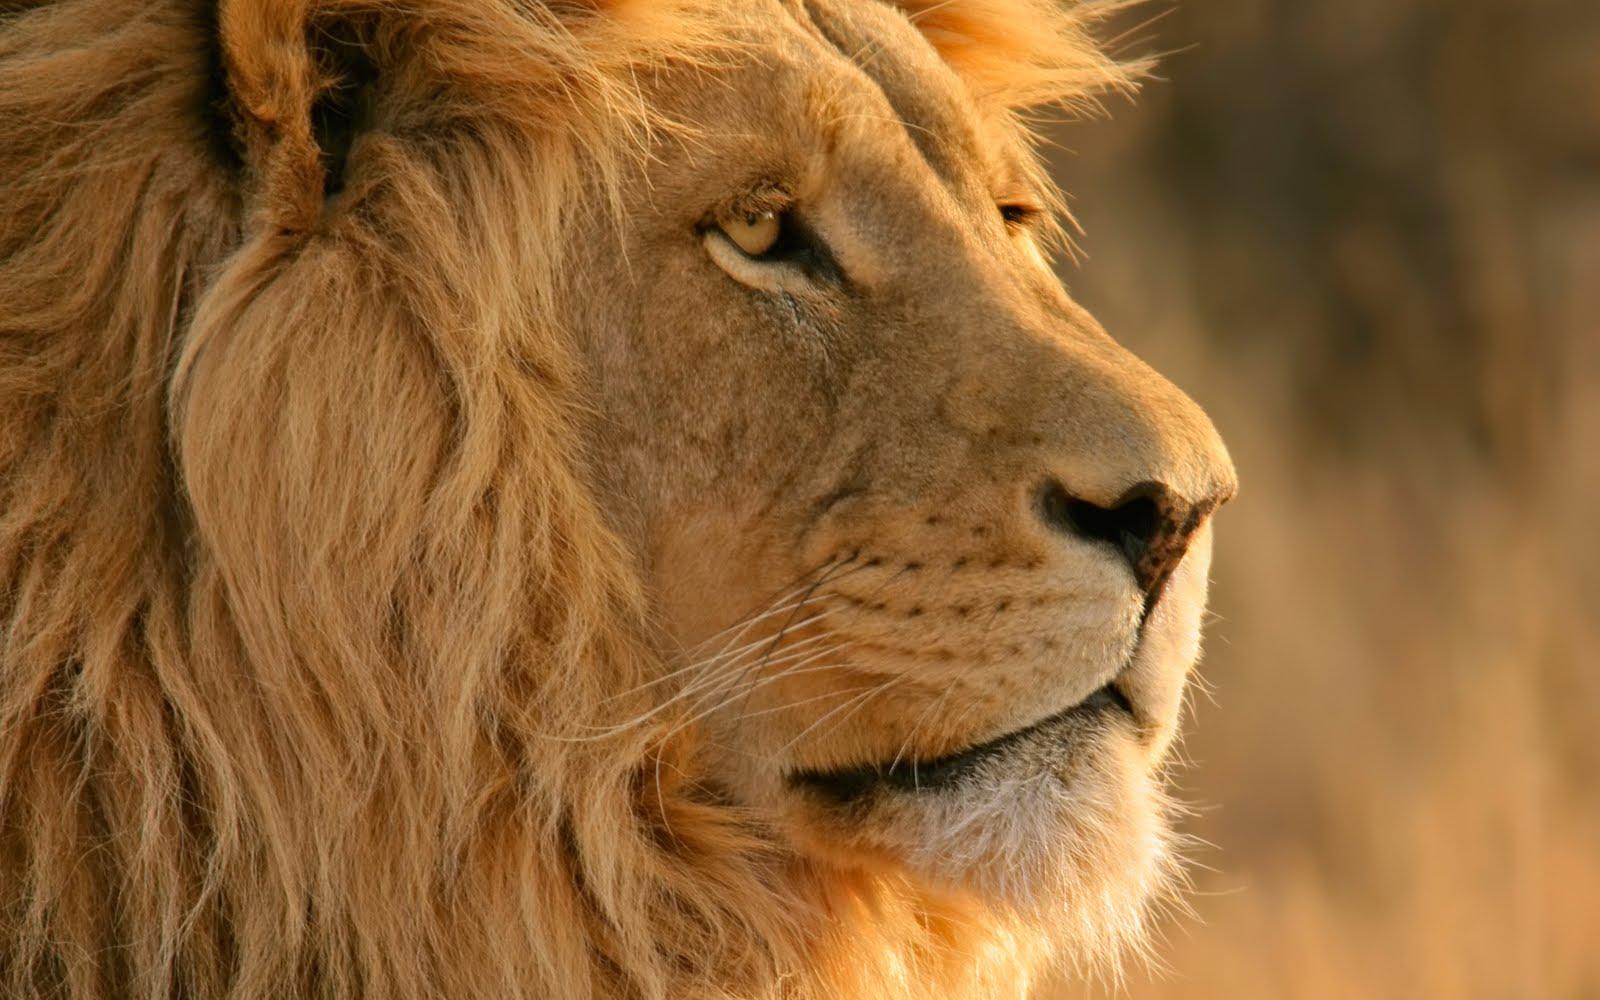 http://1.bp.blogspot.com/-6mmHshA2baE/TgaoTvR5rYI/AAAAAAAACZY/58CzAttdk-8/s1600/Lion.jpg